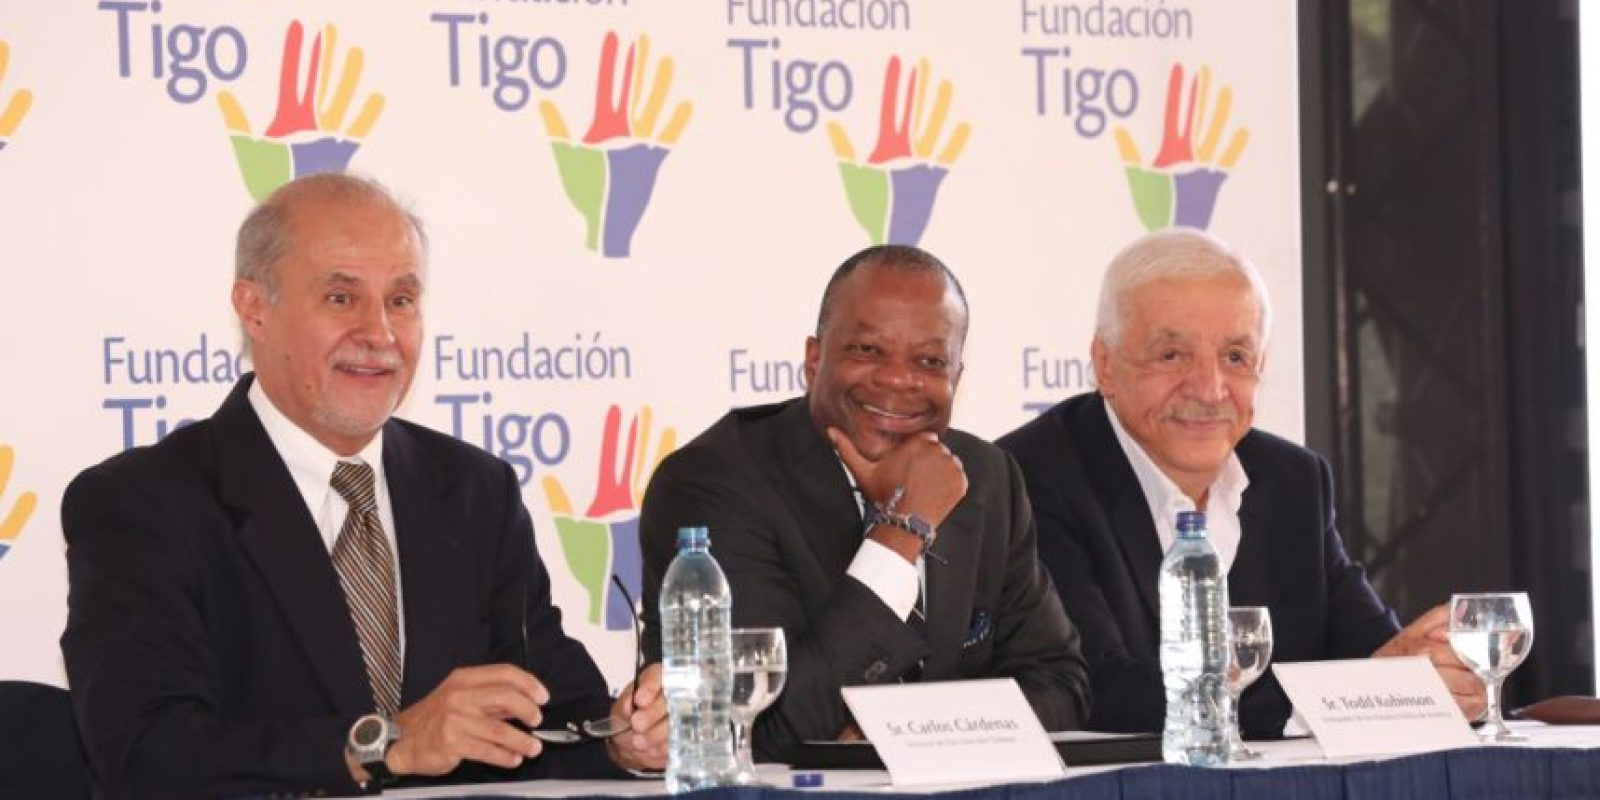 Foto:Cortesía Fundación Tigo